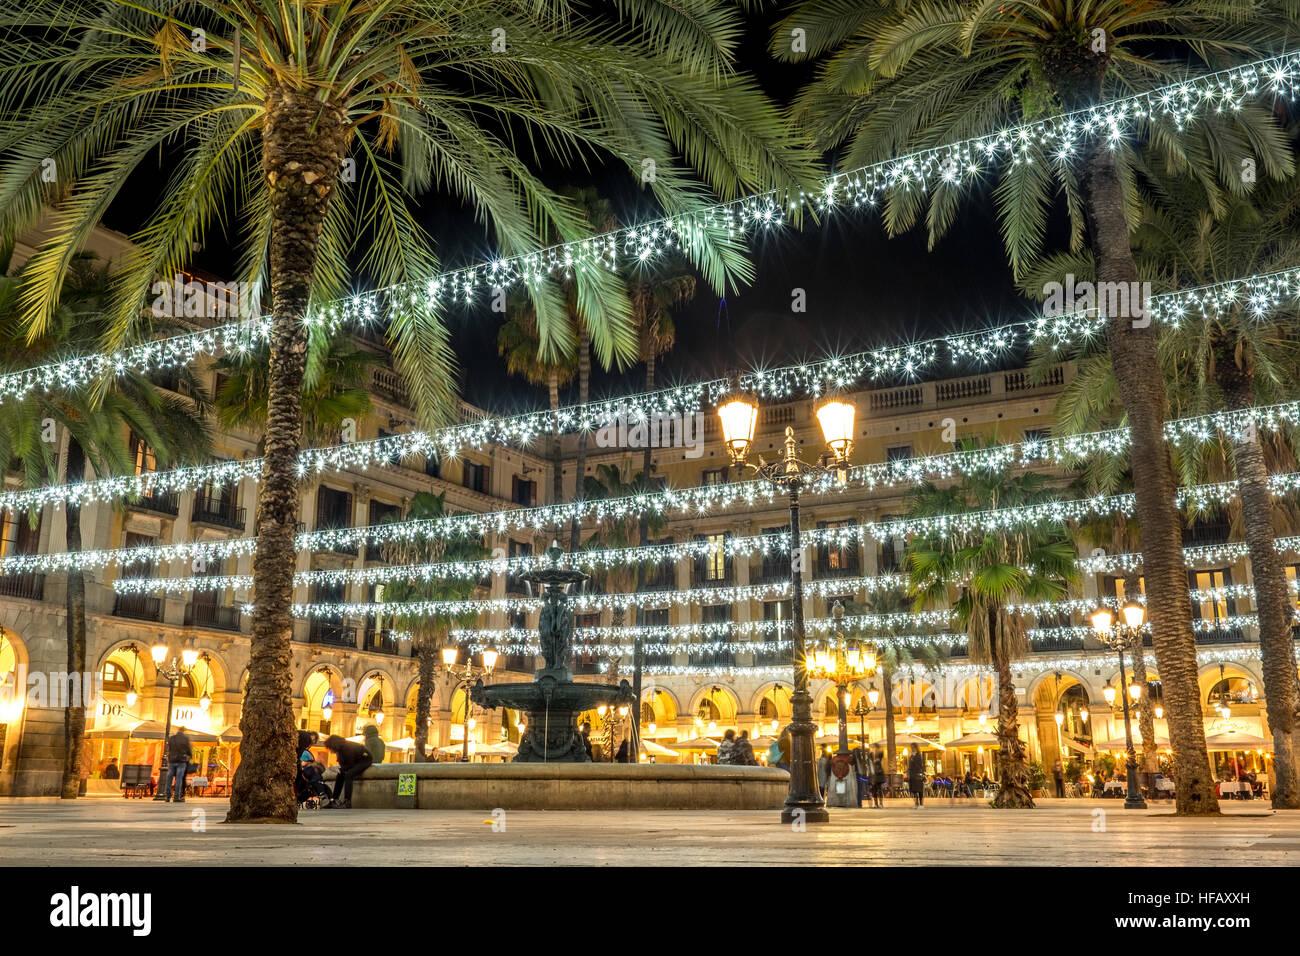 Placa Reial Barcelona city street light night christmas fairy lights - Stock Image